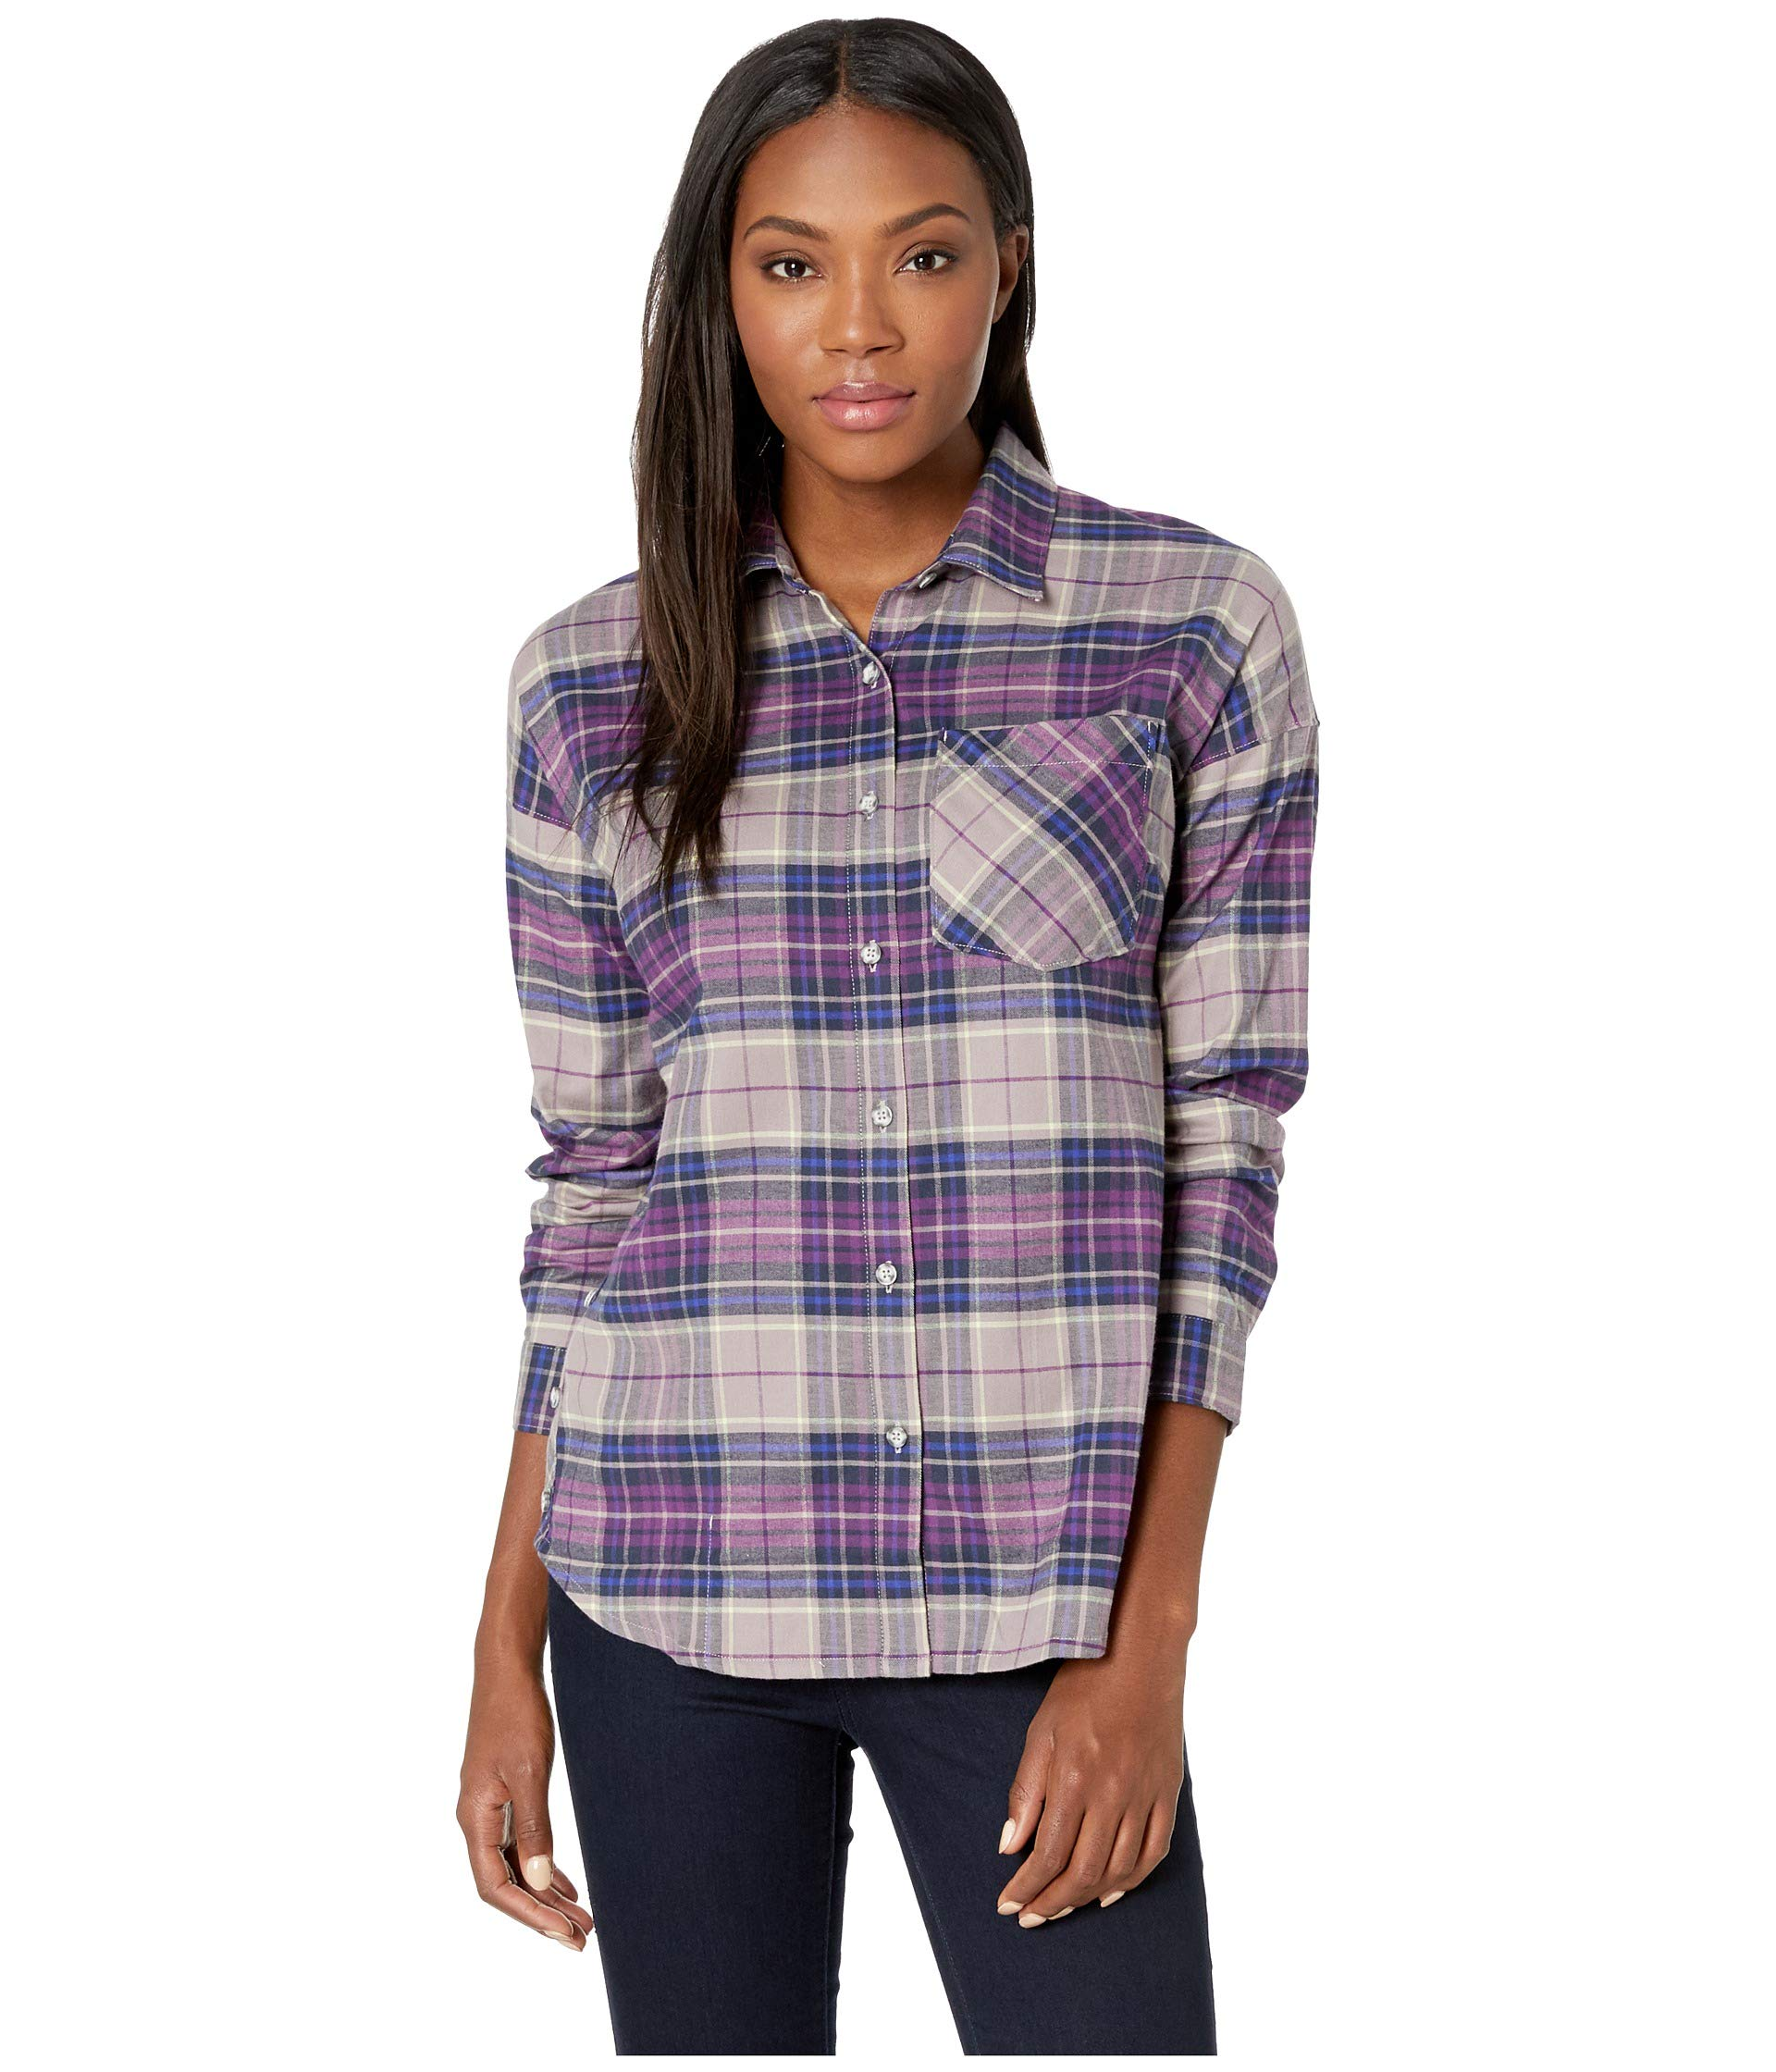 Shirt Karsee™ Hardwear Mountain Sleeve Purple Long Cosmos WBpW70qH